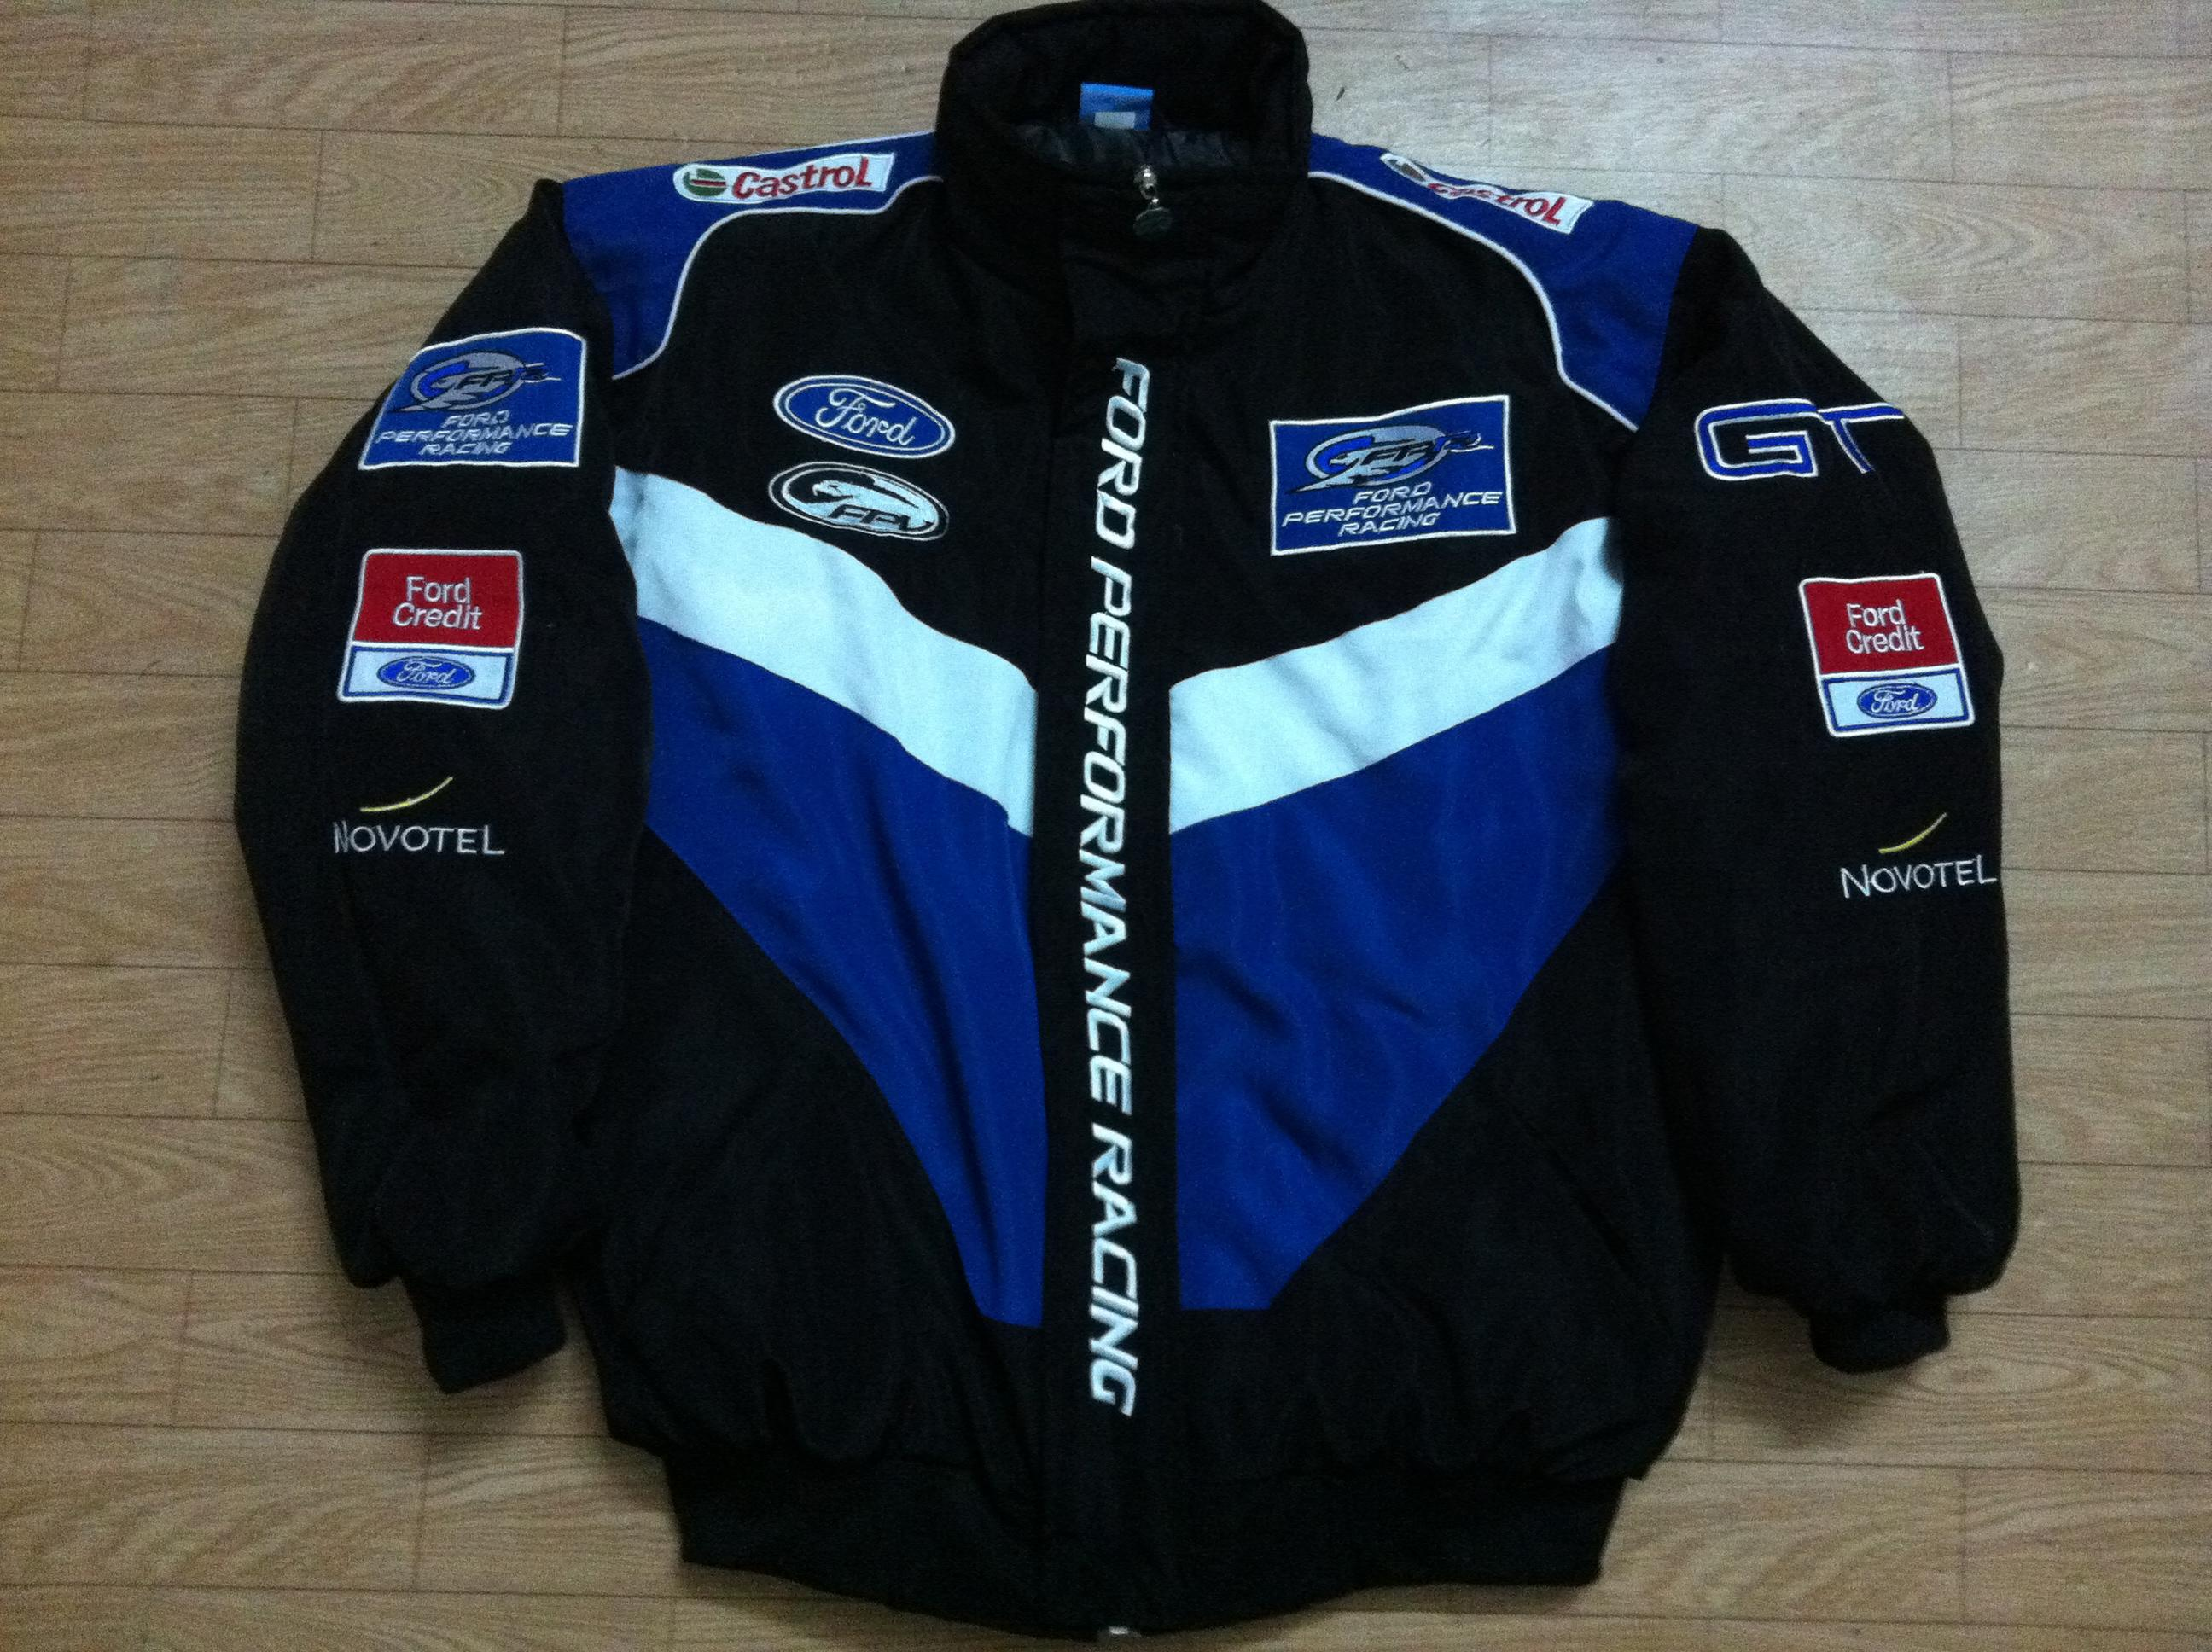 Embroidery logo f1 fia nascar indycar v8 supercar racing cotton jacket ford performance racing jacket a163 outerwear mens jackets denim jacket sheepskin